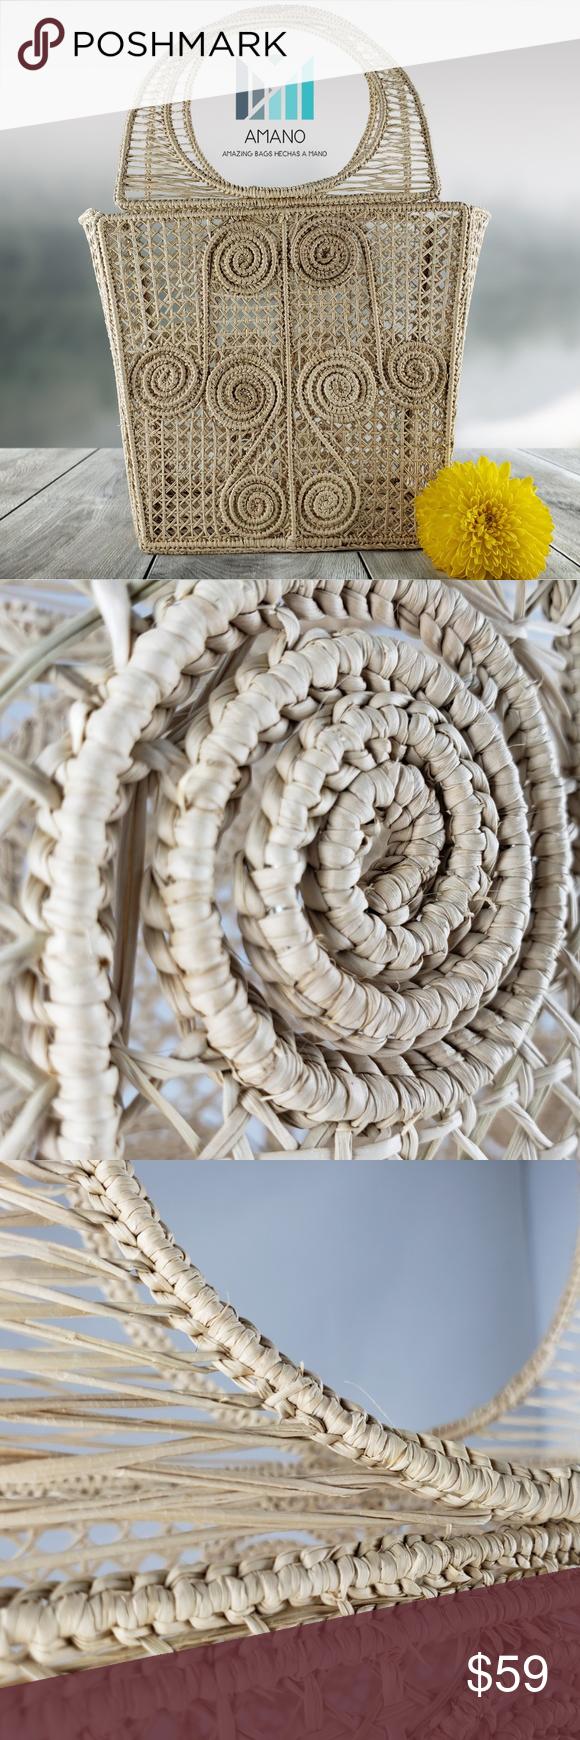 handmade in Colombia BLUE IRACA PALM basket bag Iraca palm handbag